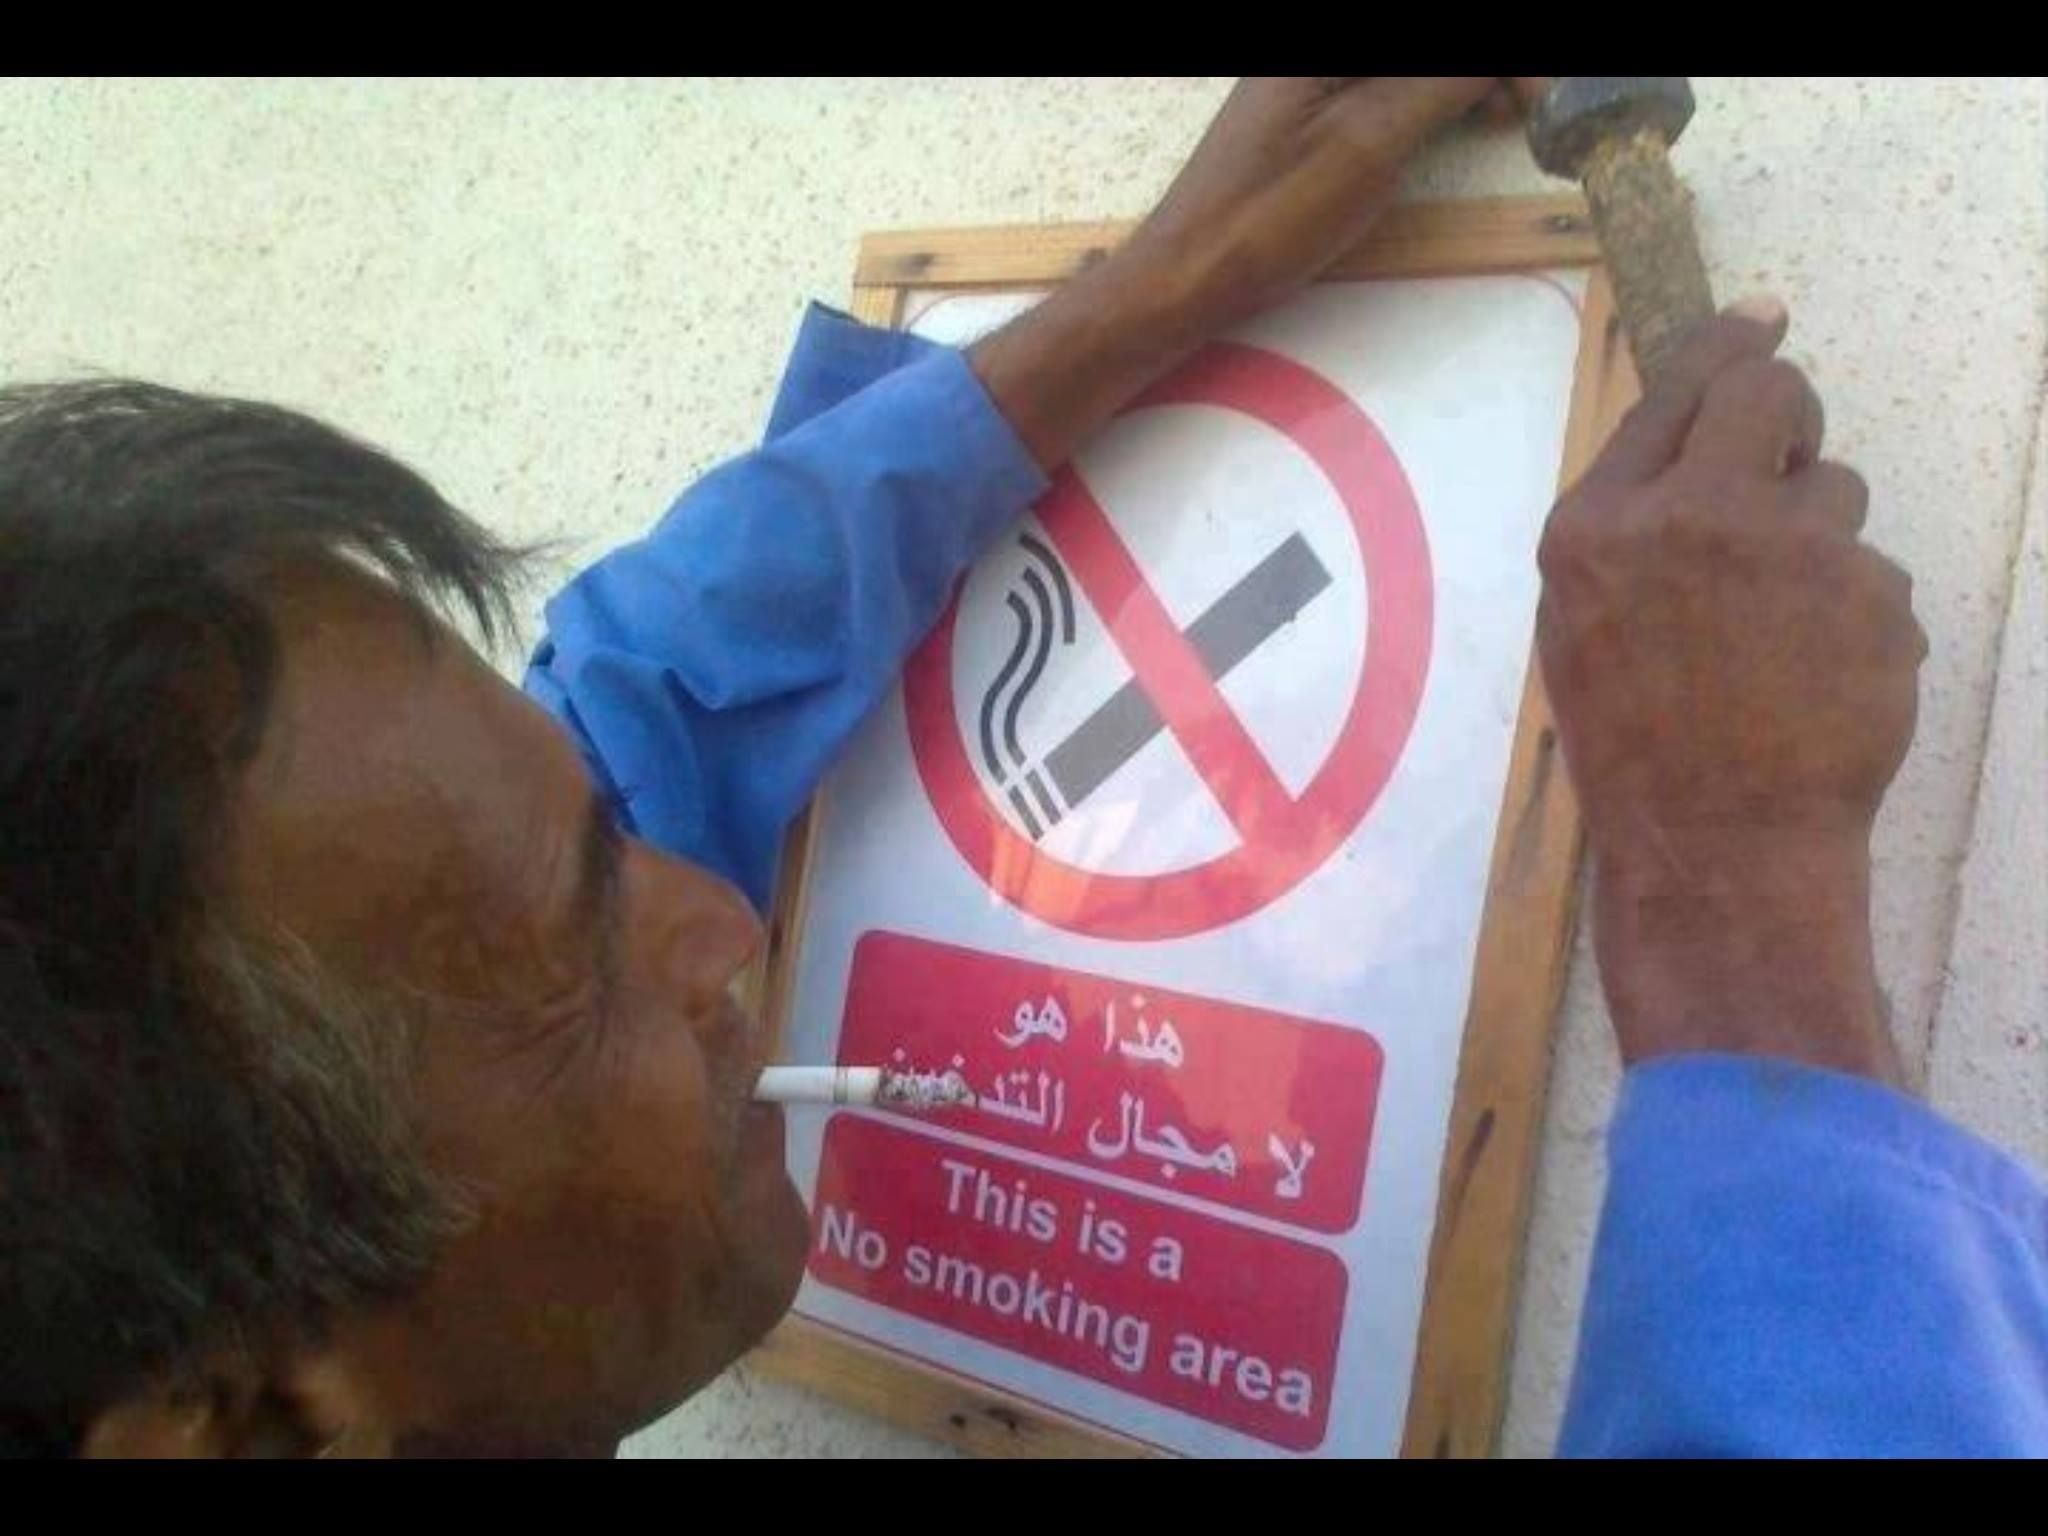 Sigara ��ilmez